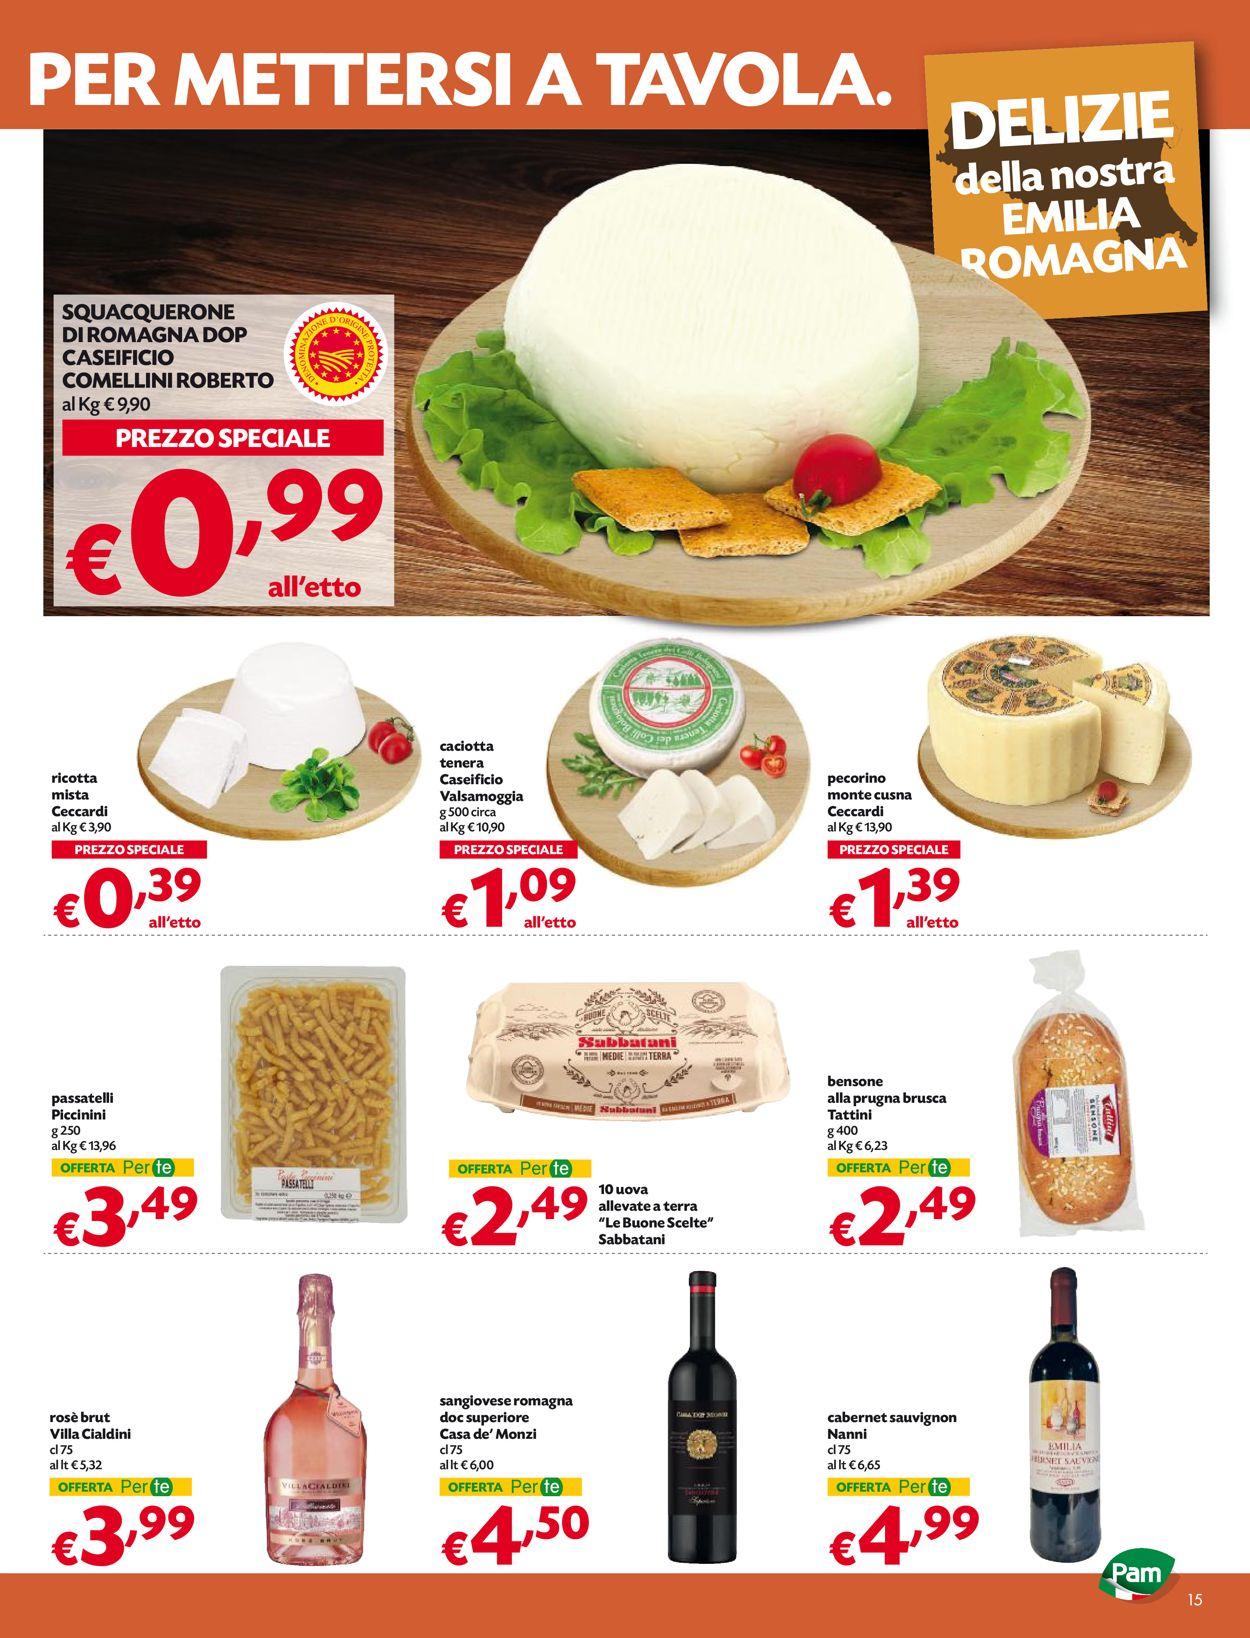 Volantino Pam Panorama - Offerte 06/04-21/04/2021 (Pagina 15)